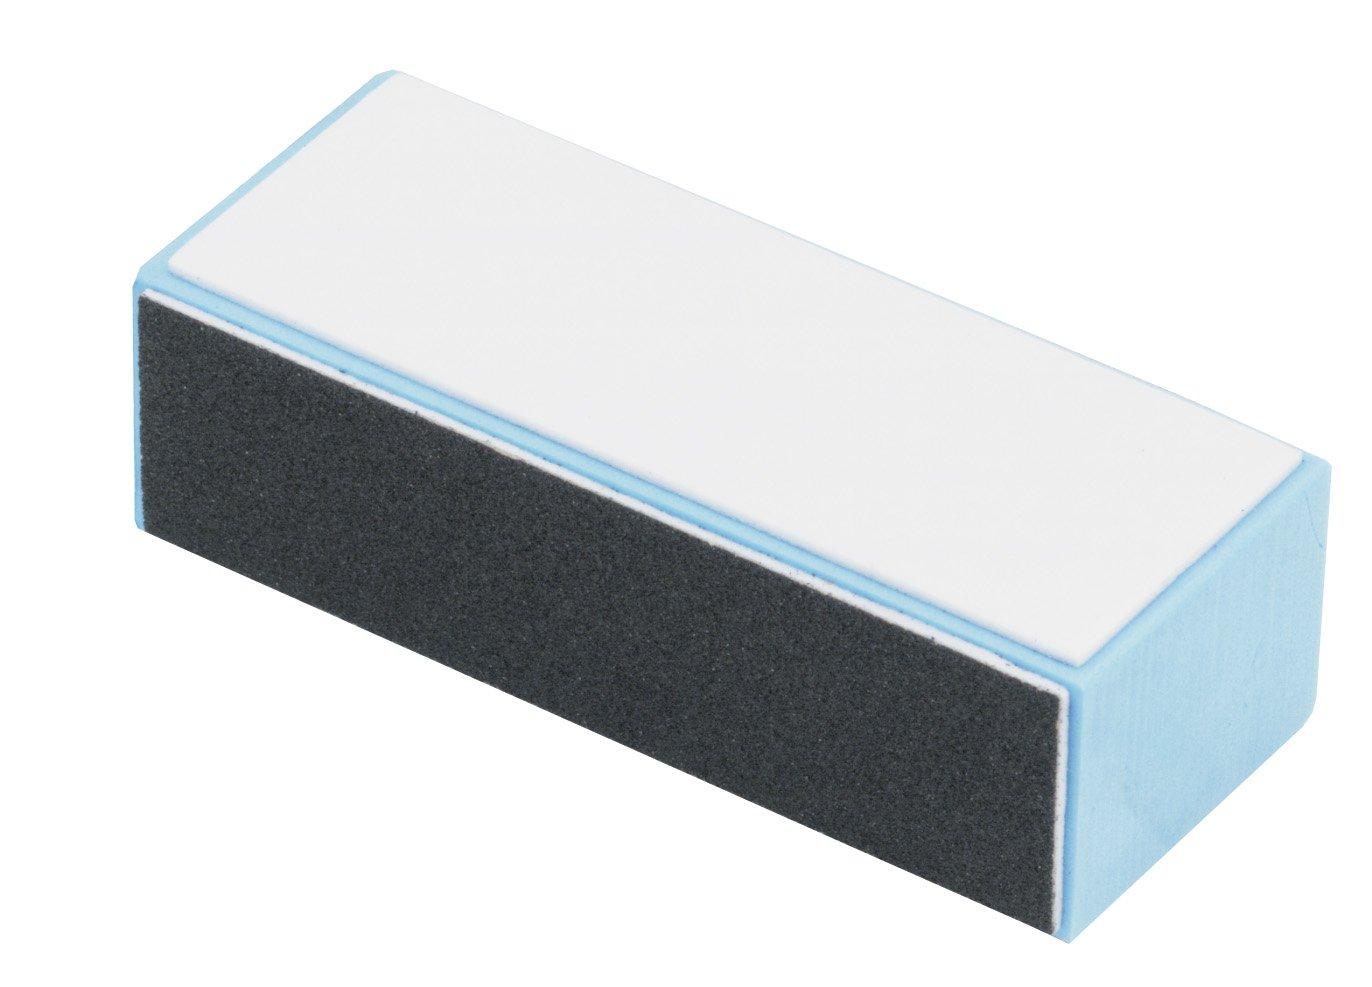 Diane 4-in-1 Shining Nail File Block, Blue, 50 Count 824703009746 | eBay